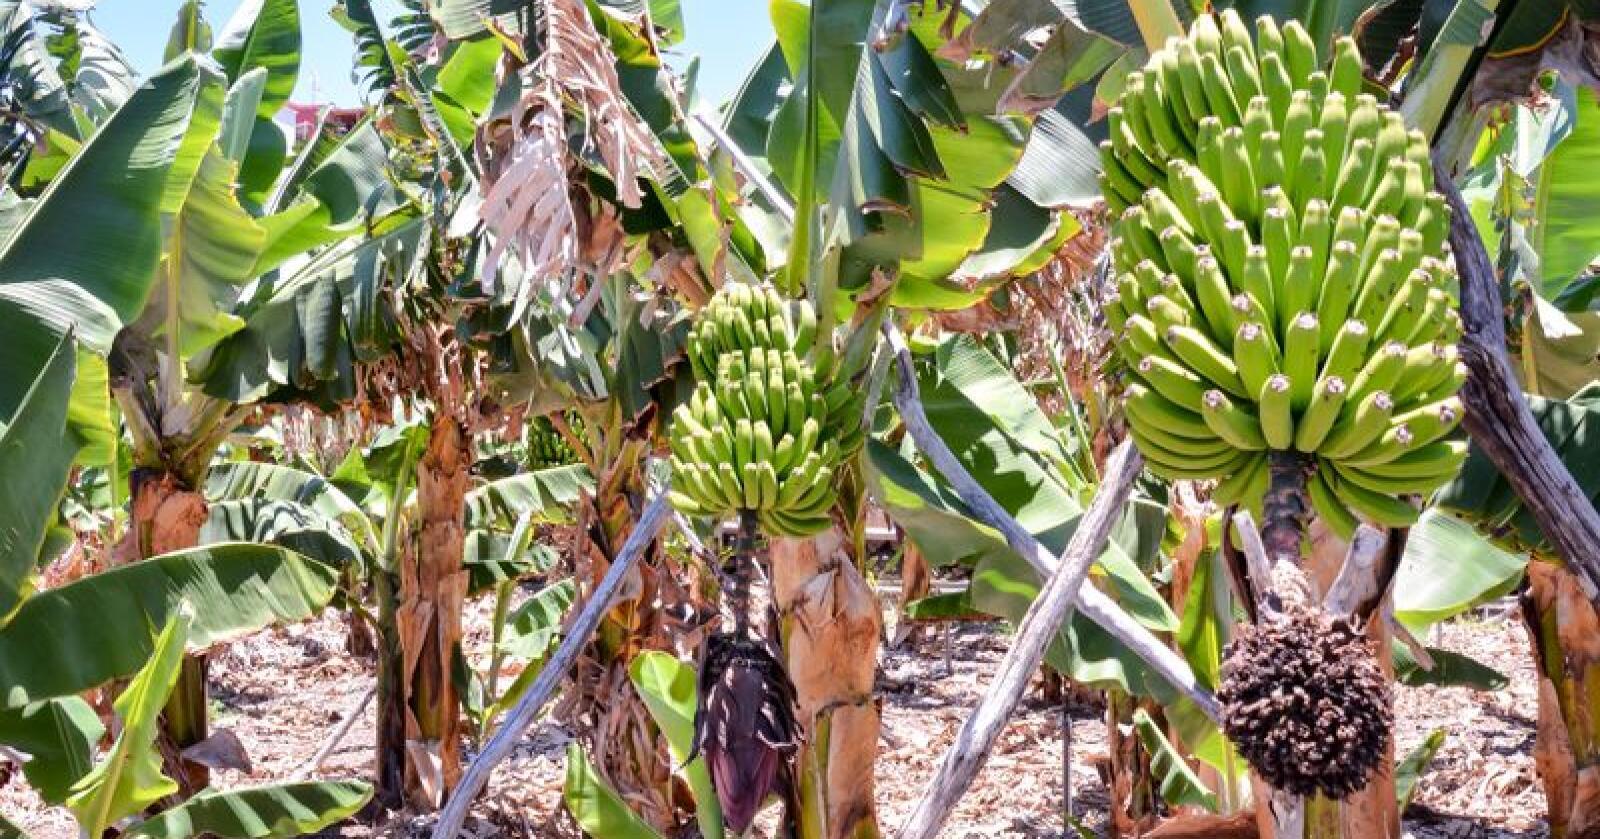 Bananplantasje på Kanariøyene. Foto: Colourbox